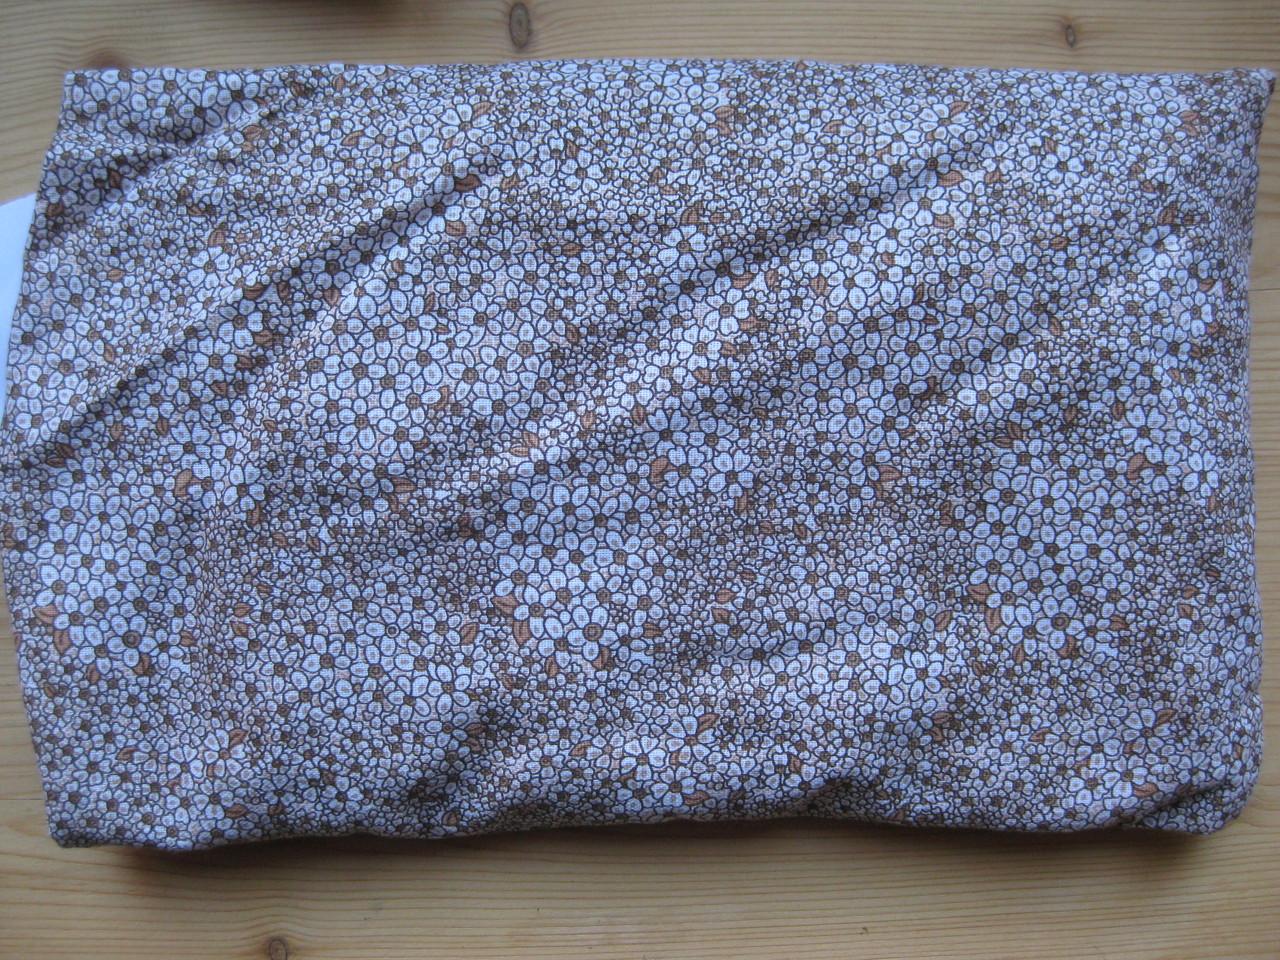 Traubenkernkissen 3 15cm x 23cm Fr. 19.00